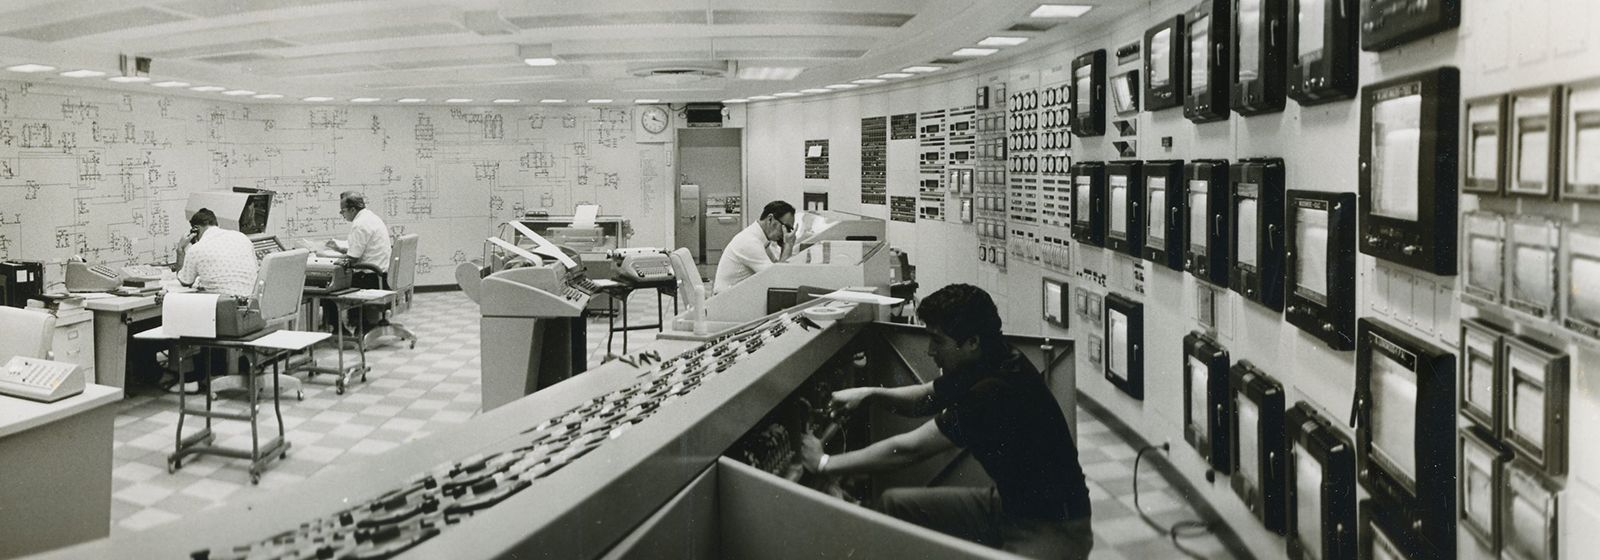 Retro photos: At the controls